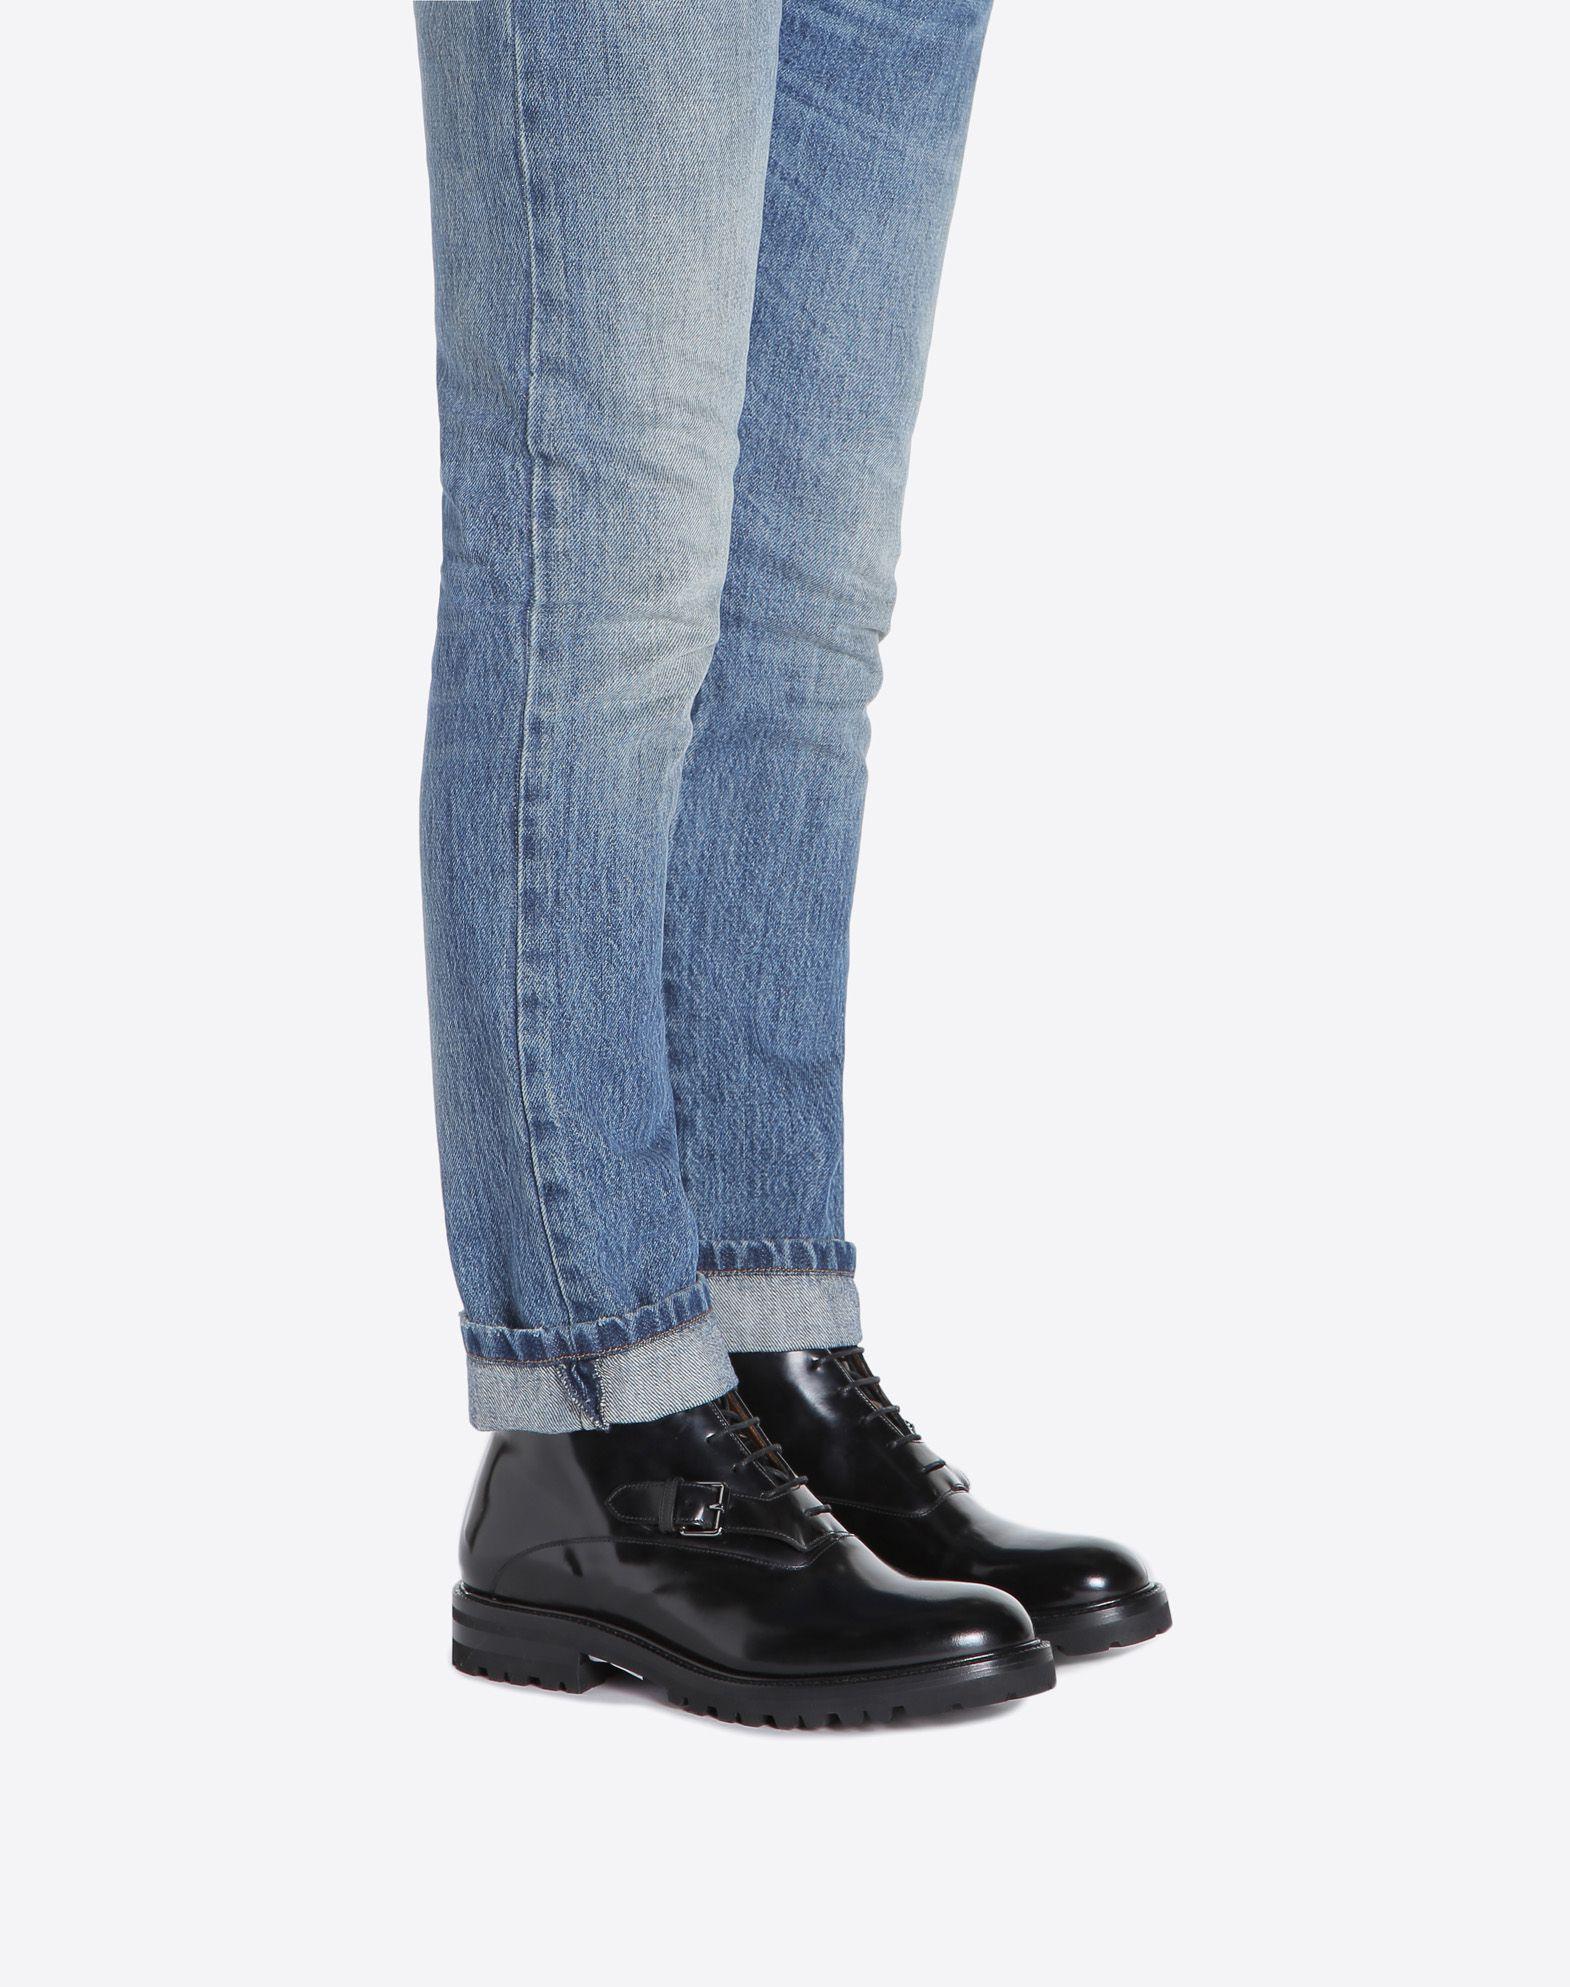 VALENTINO GARAVANI UOMO 靴子 短靴 U a